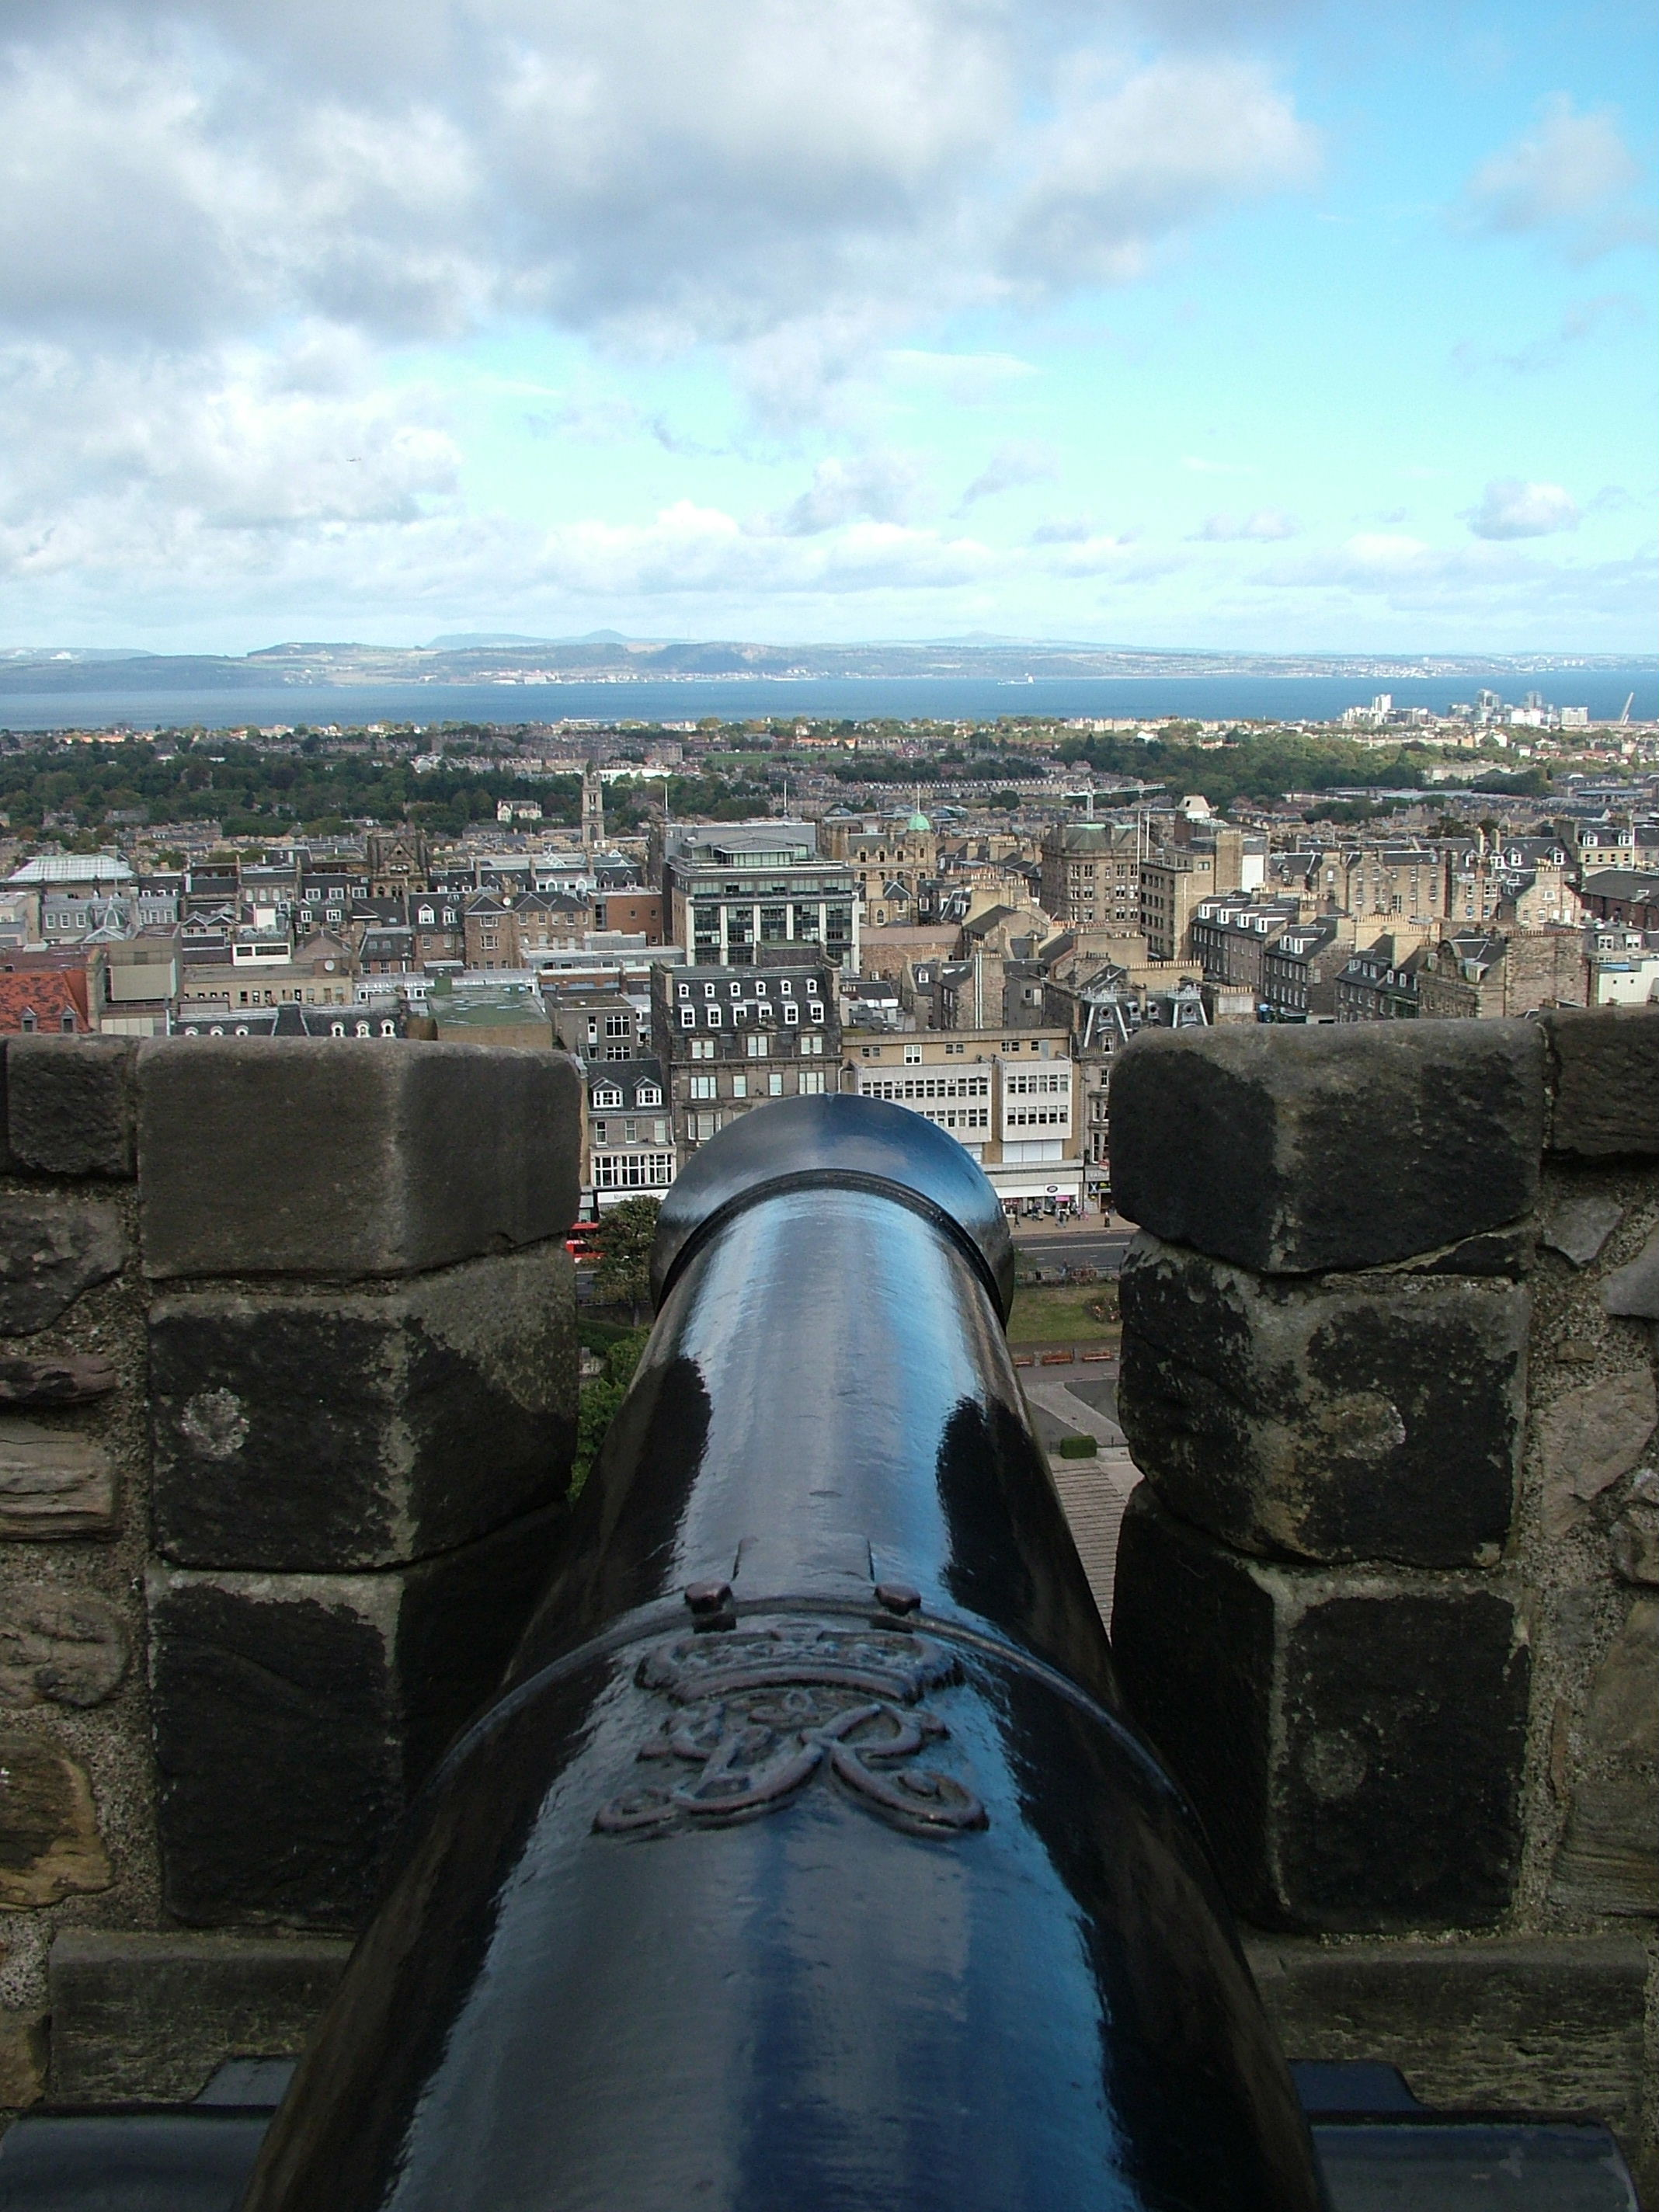 Aim, Artillery, Bspo06, Cannon, Castle, HQ Photo